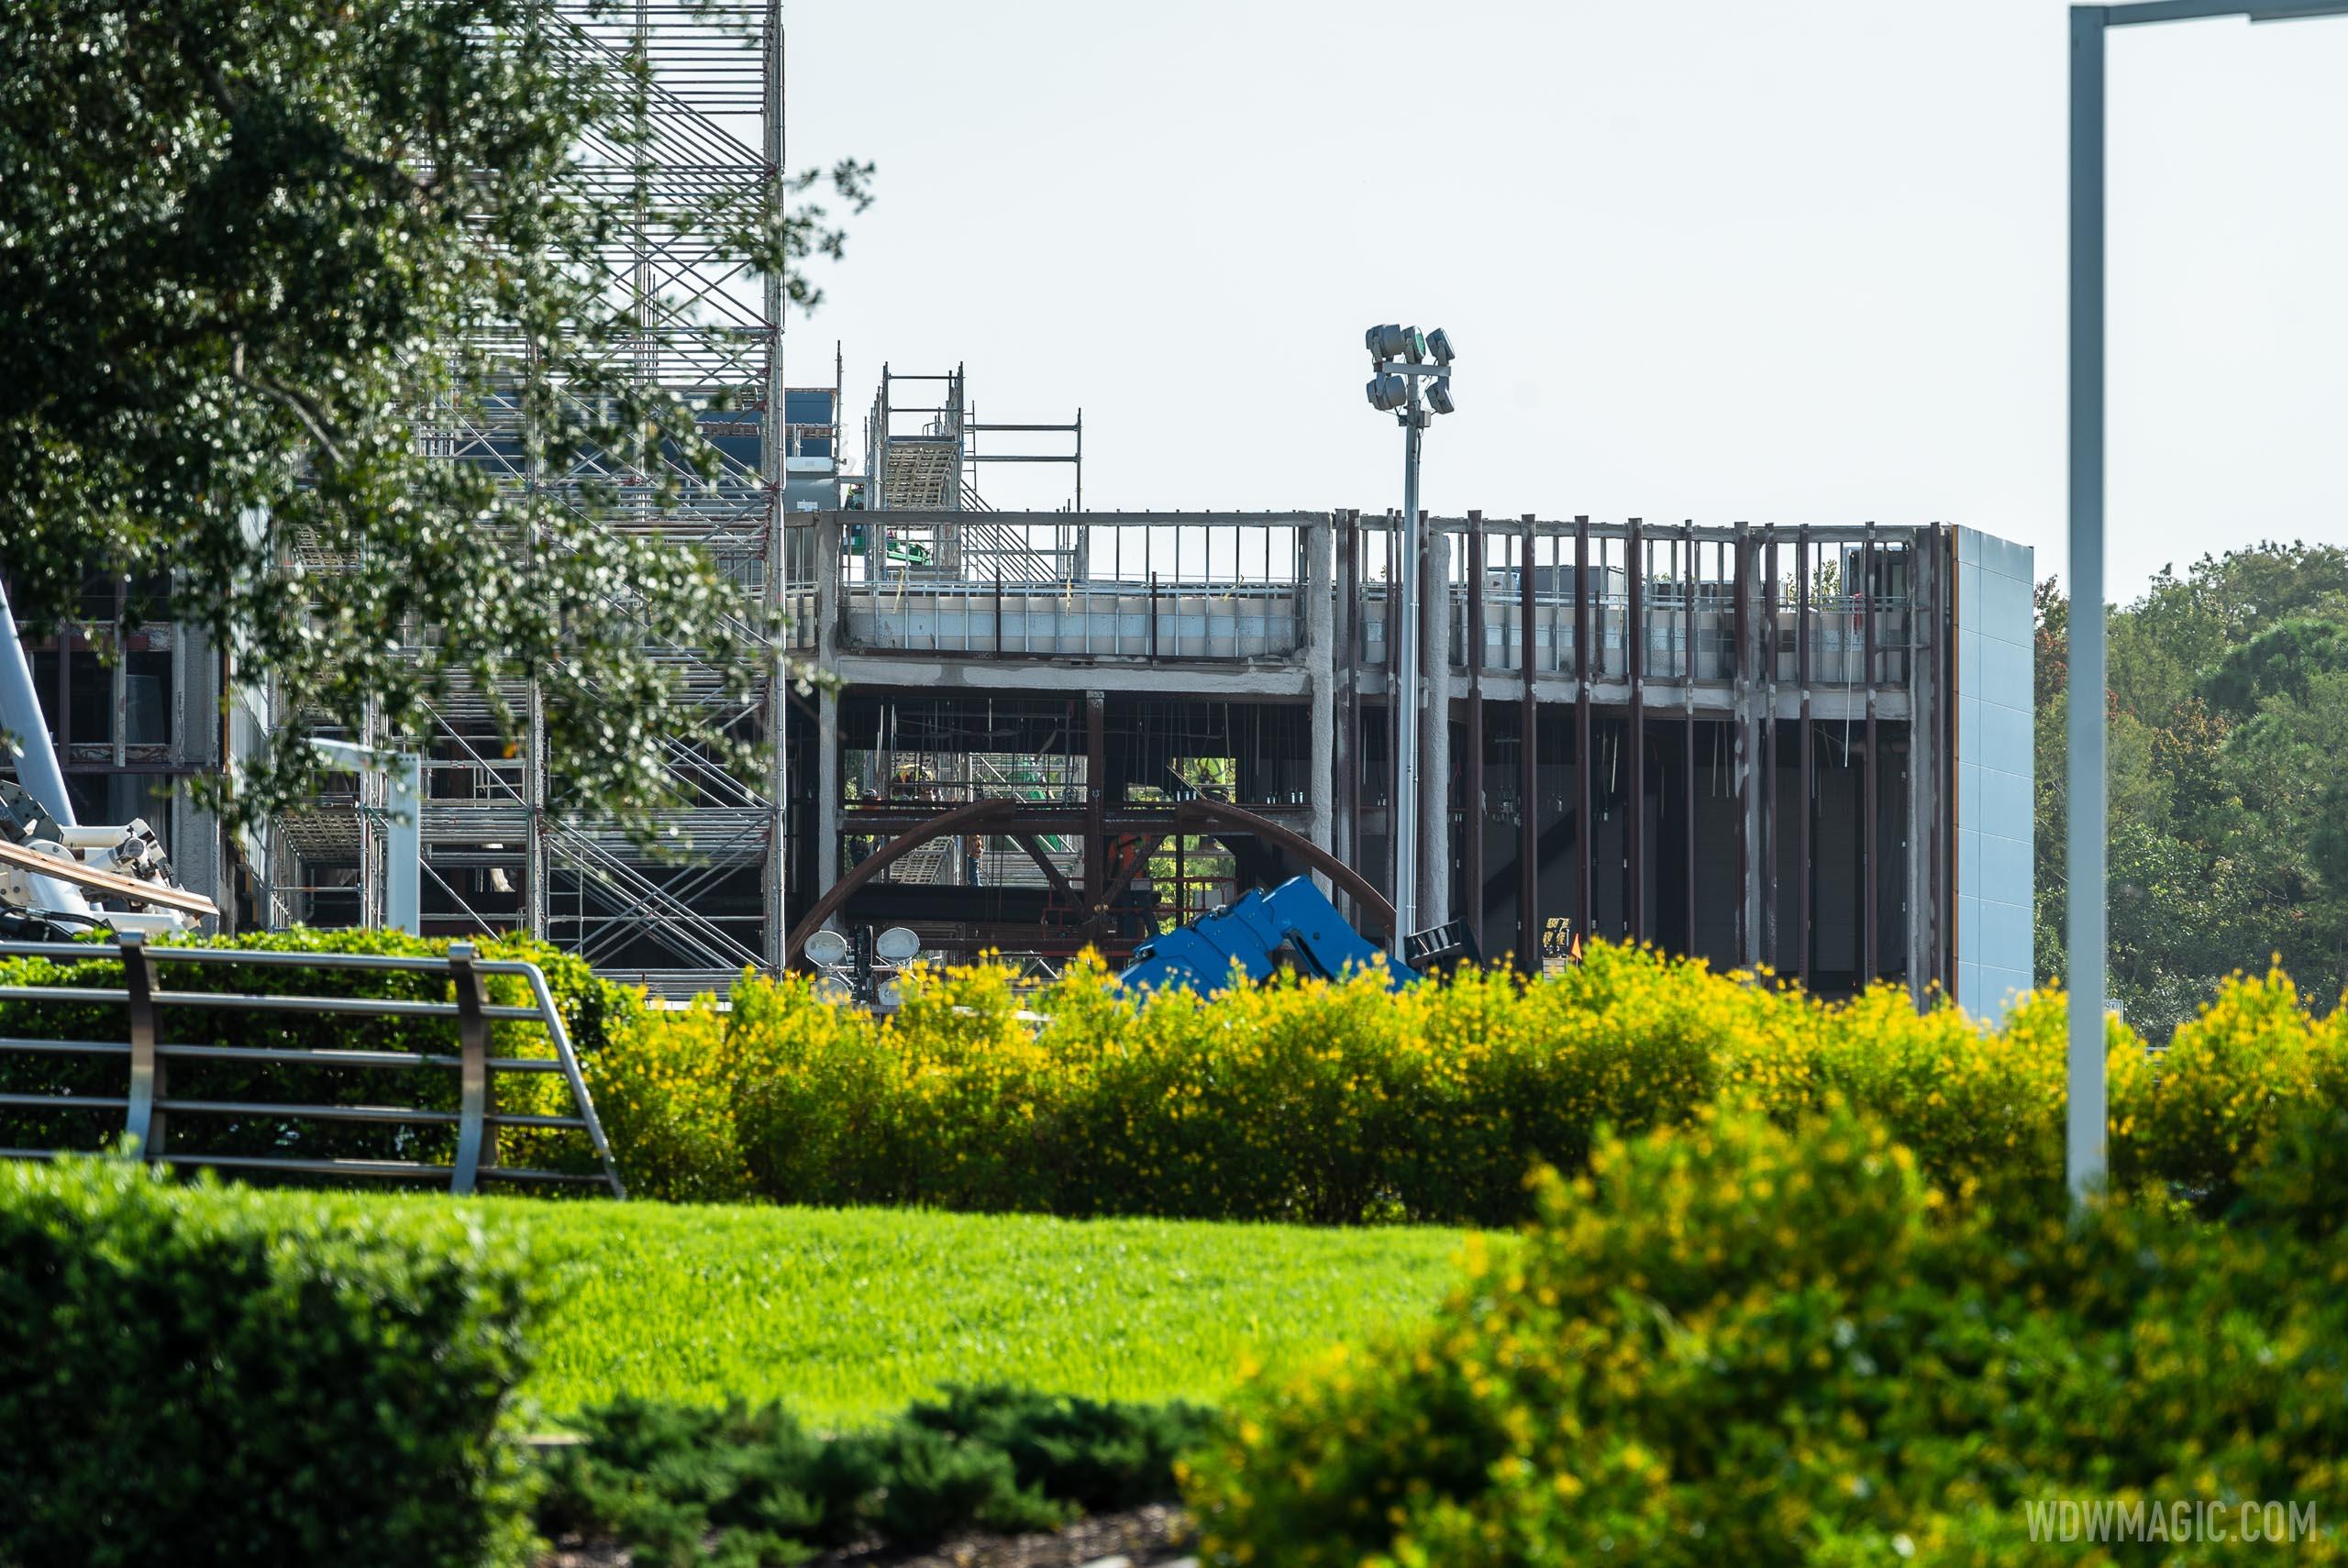 TRON Lightcycle Run construction - September 21 2020